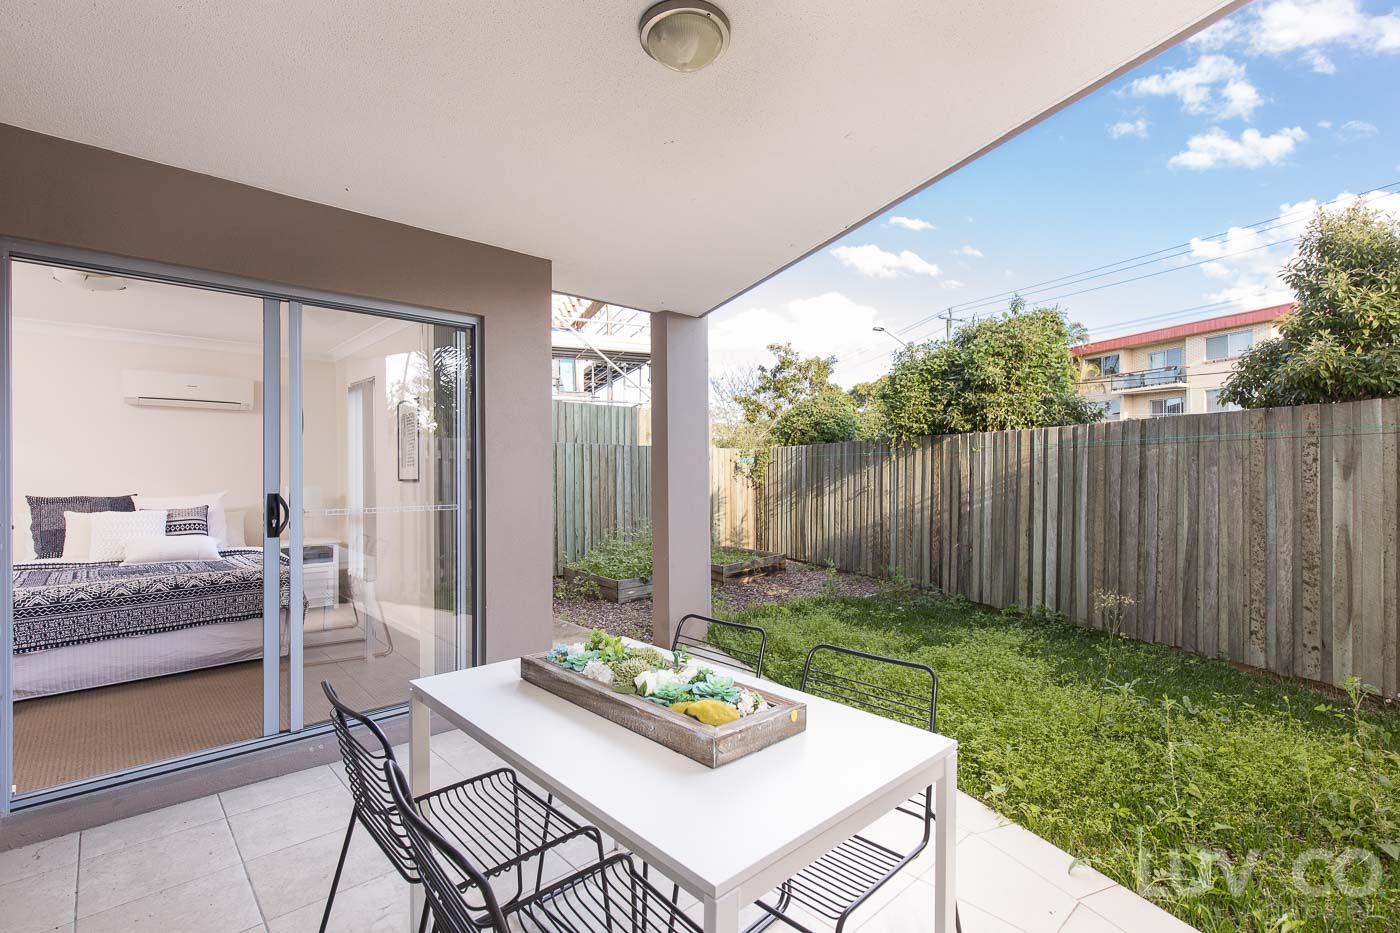 2/15 Crana Street, Gaythorne QLD 4051, Image 1